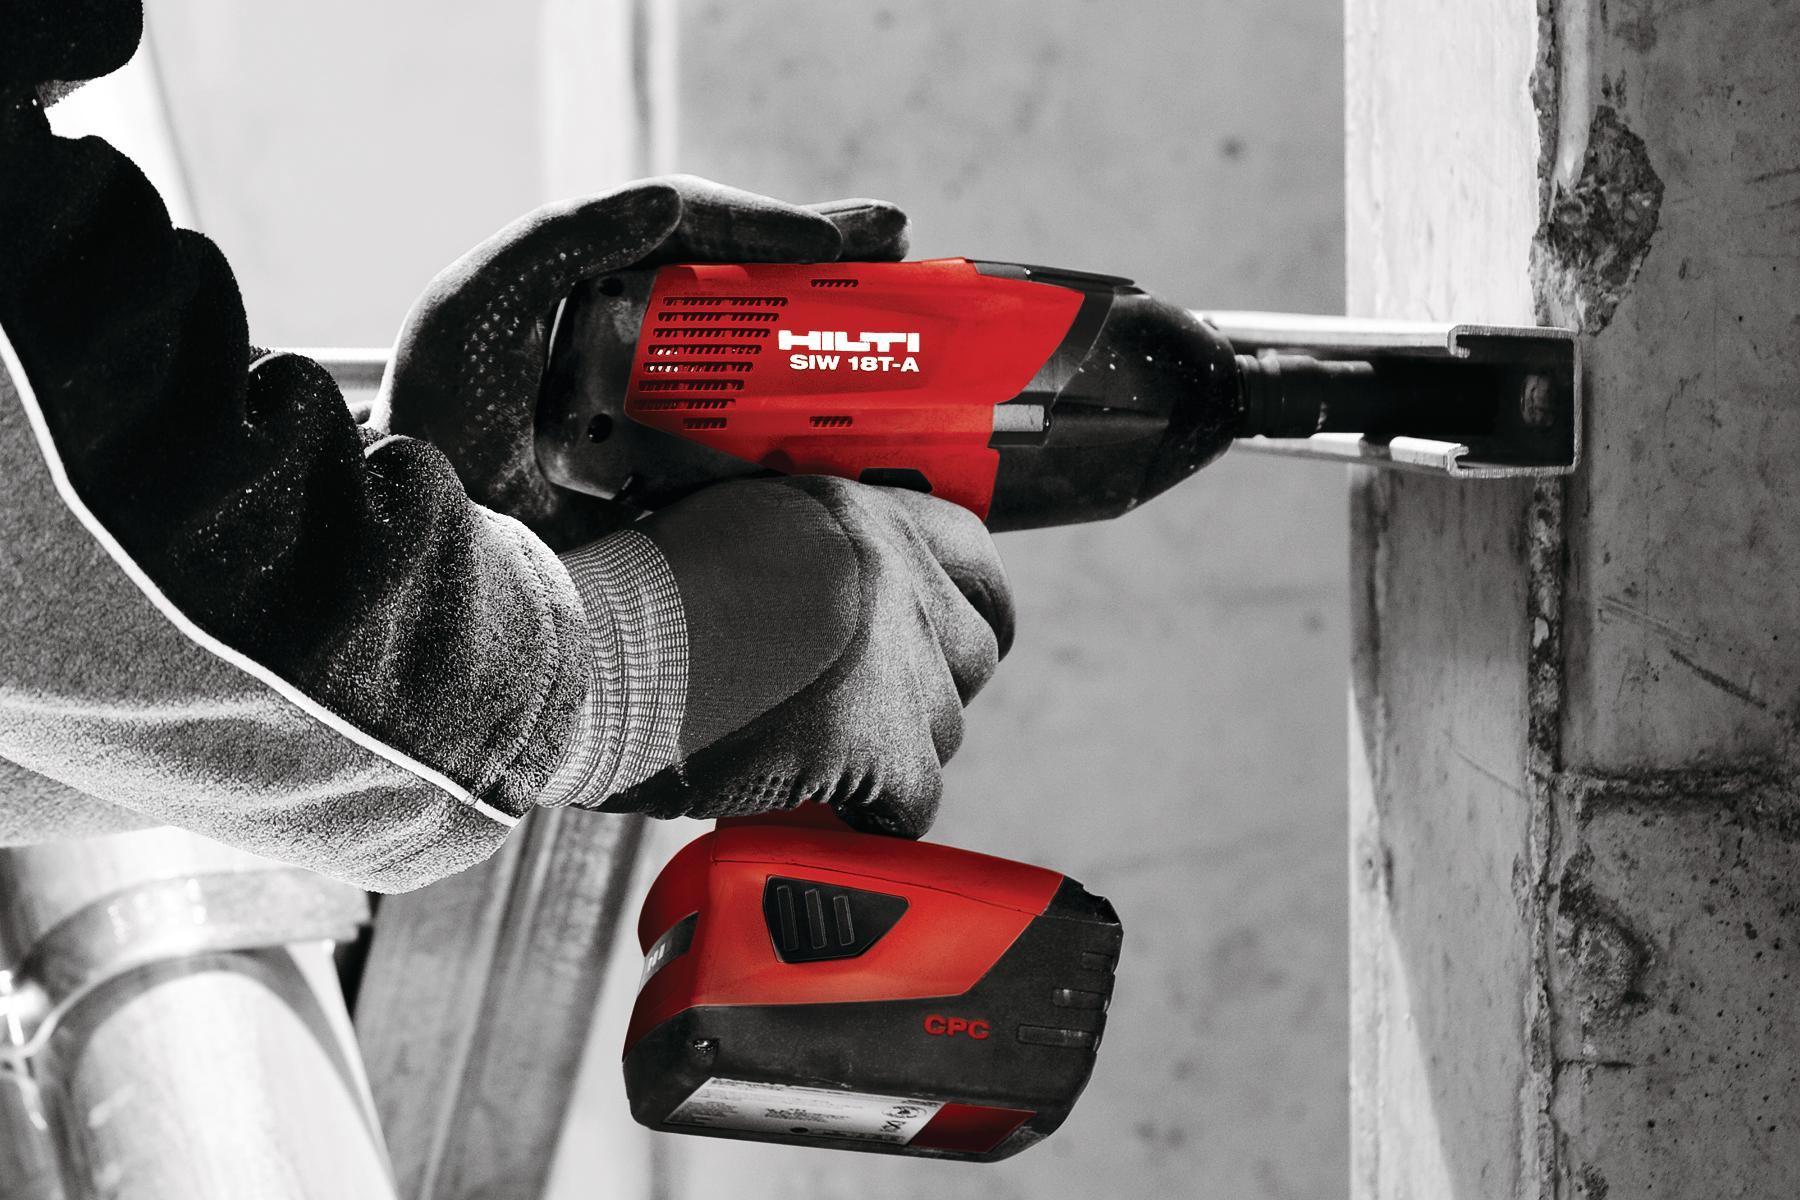 Hilti Impact Wrench Architect Magazine Tools And